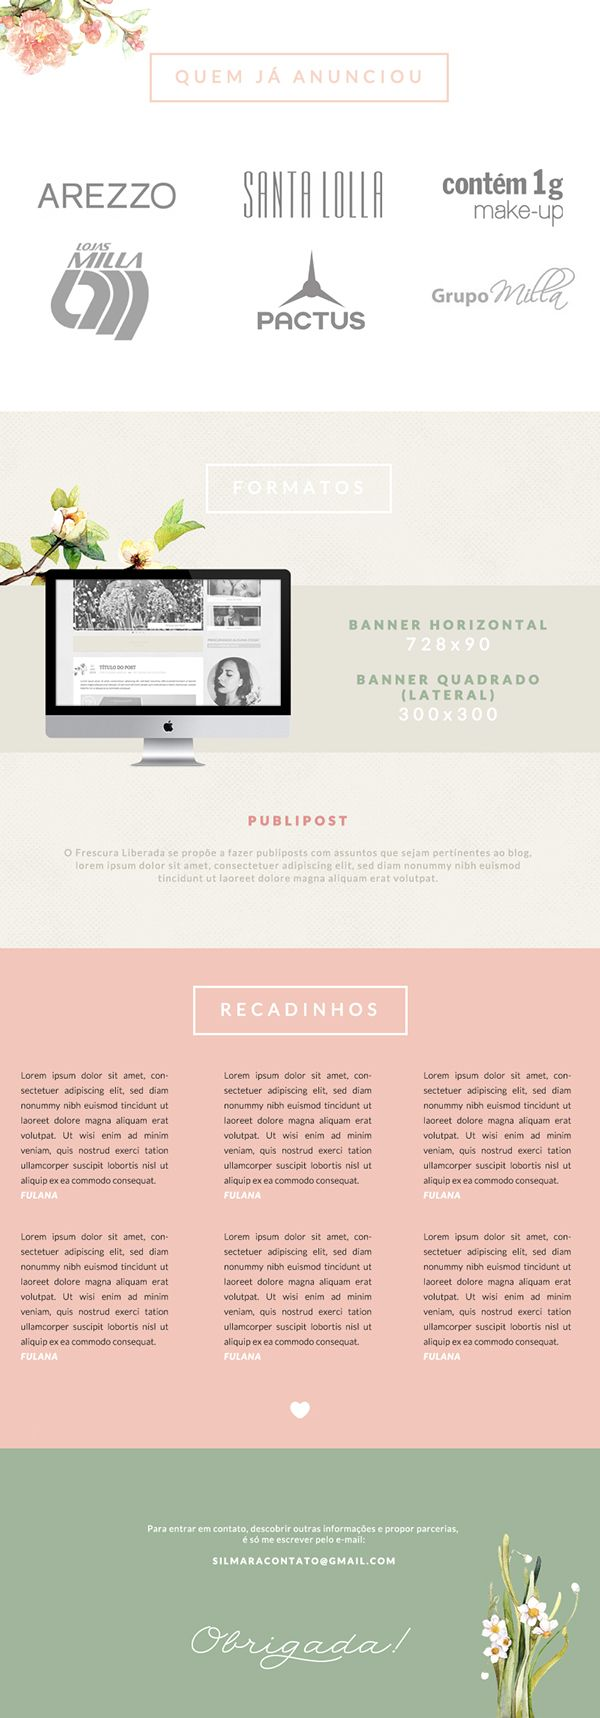 Layout: Frescura Liberada Blog on Behance